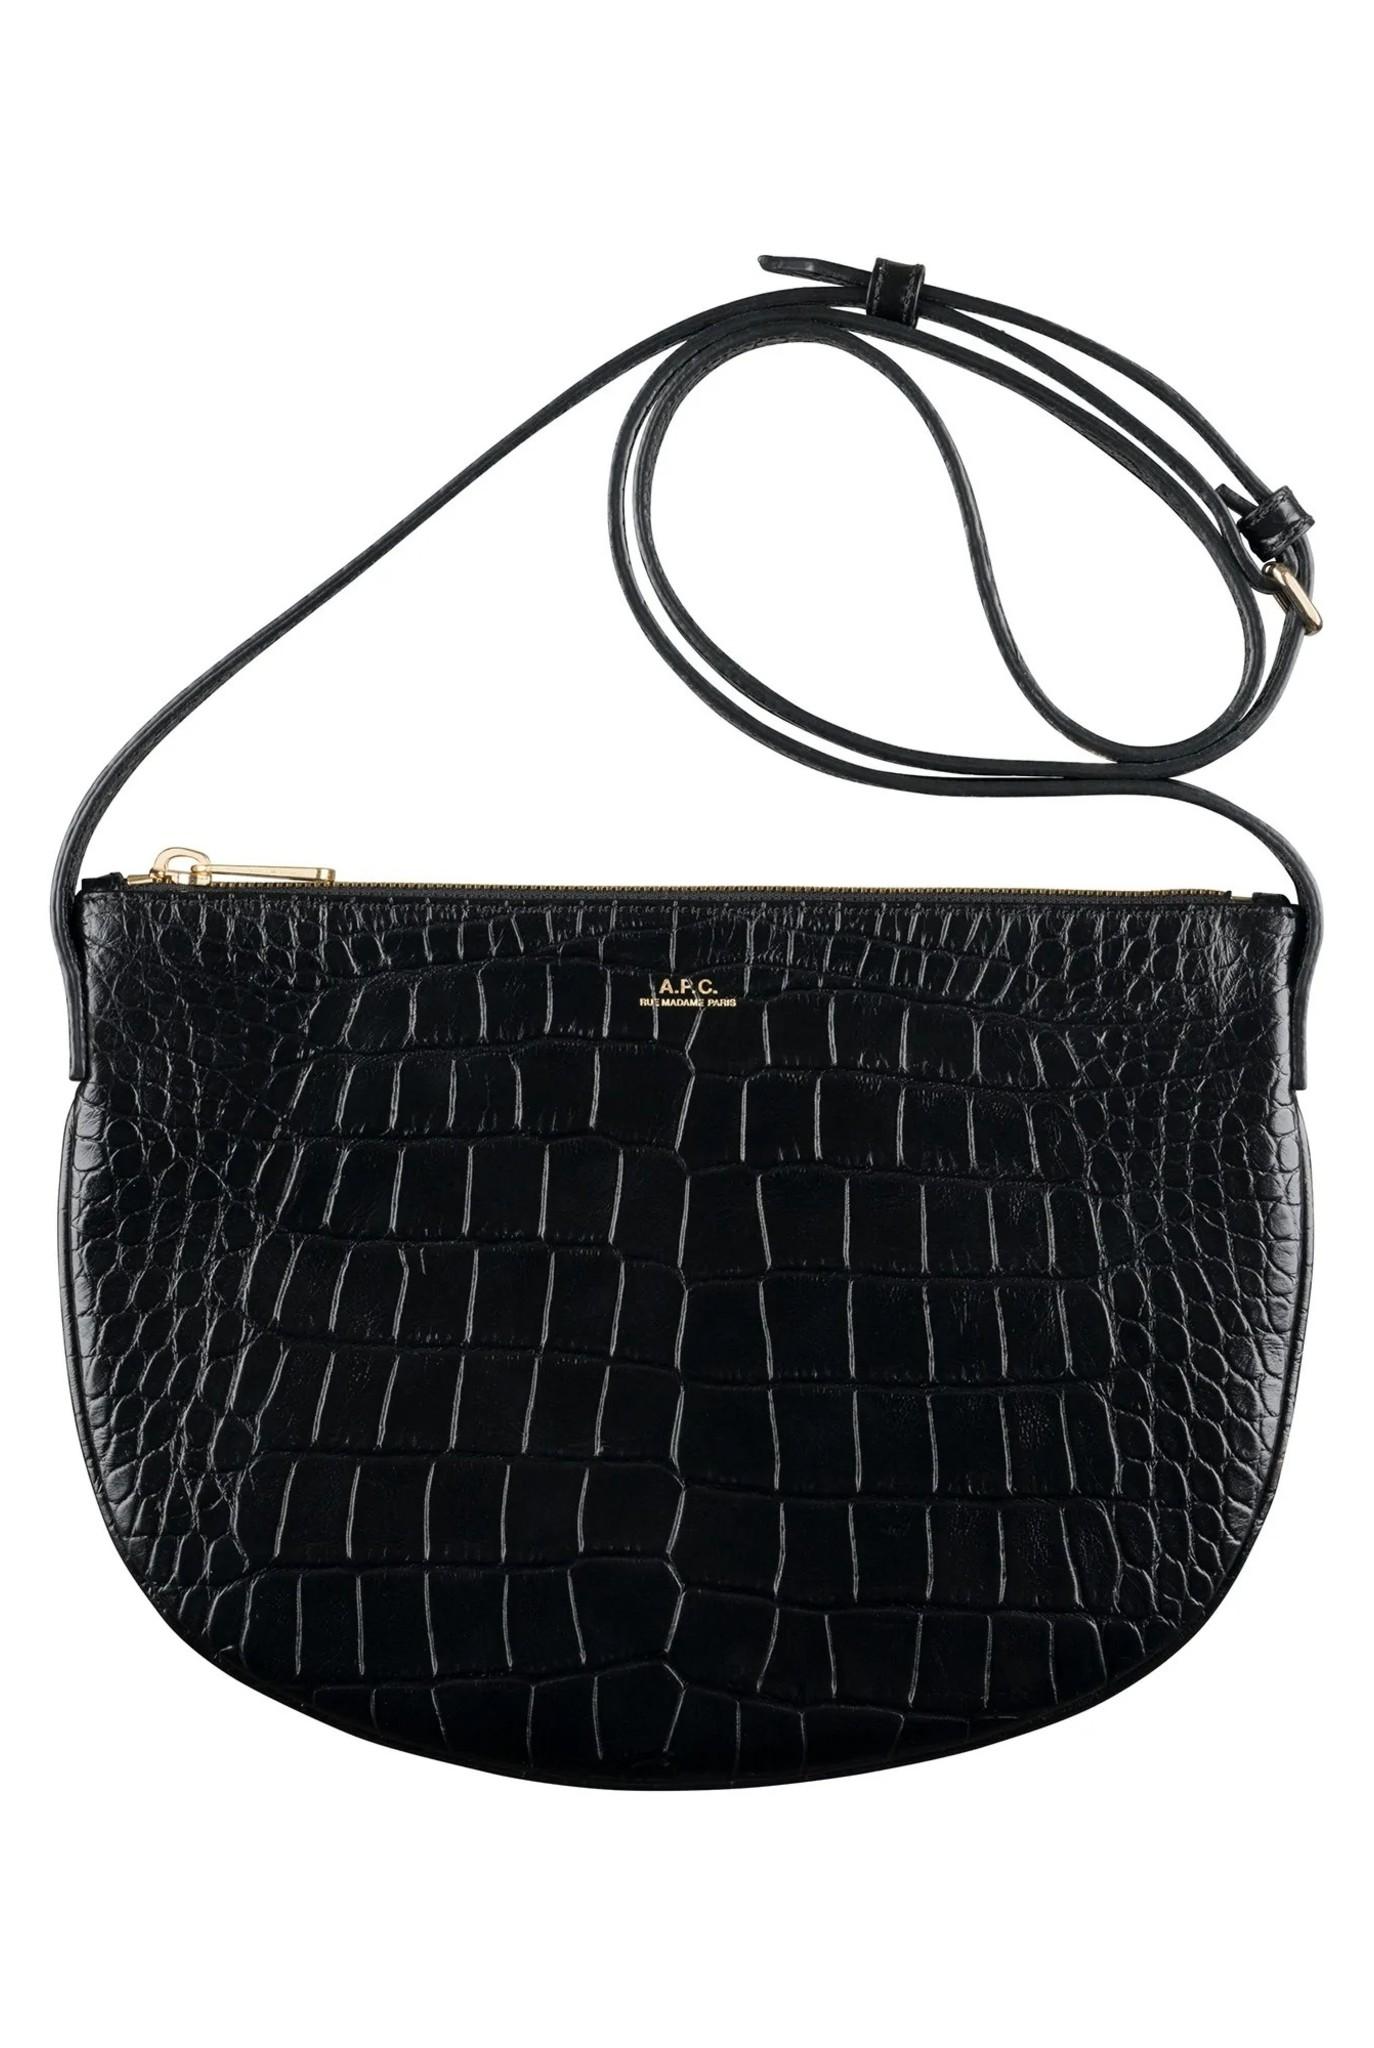 Maelys Bag Black